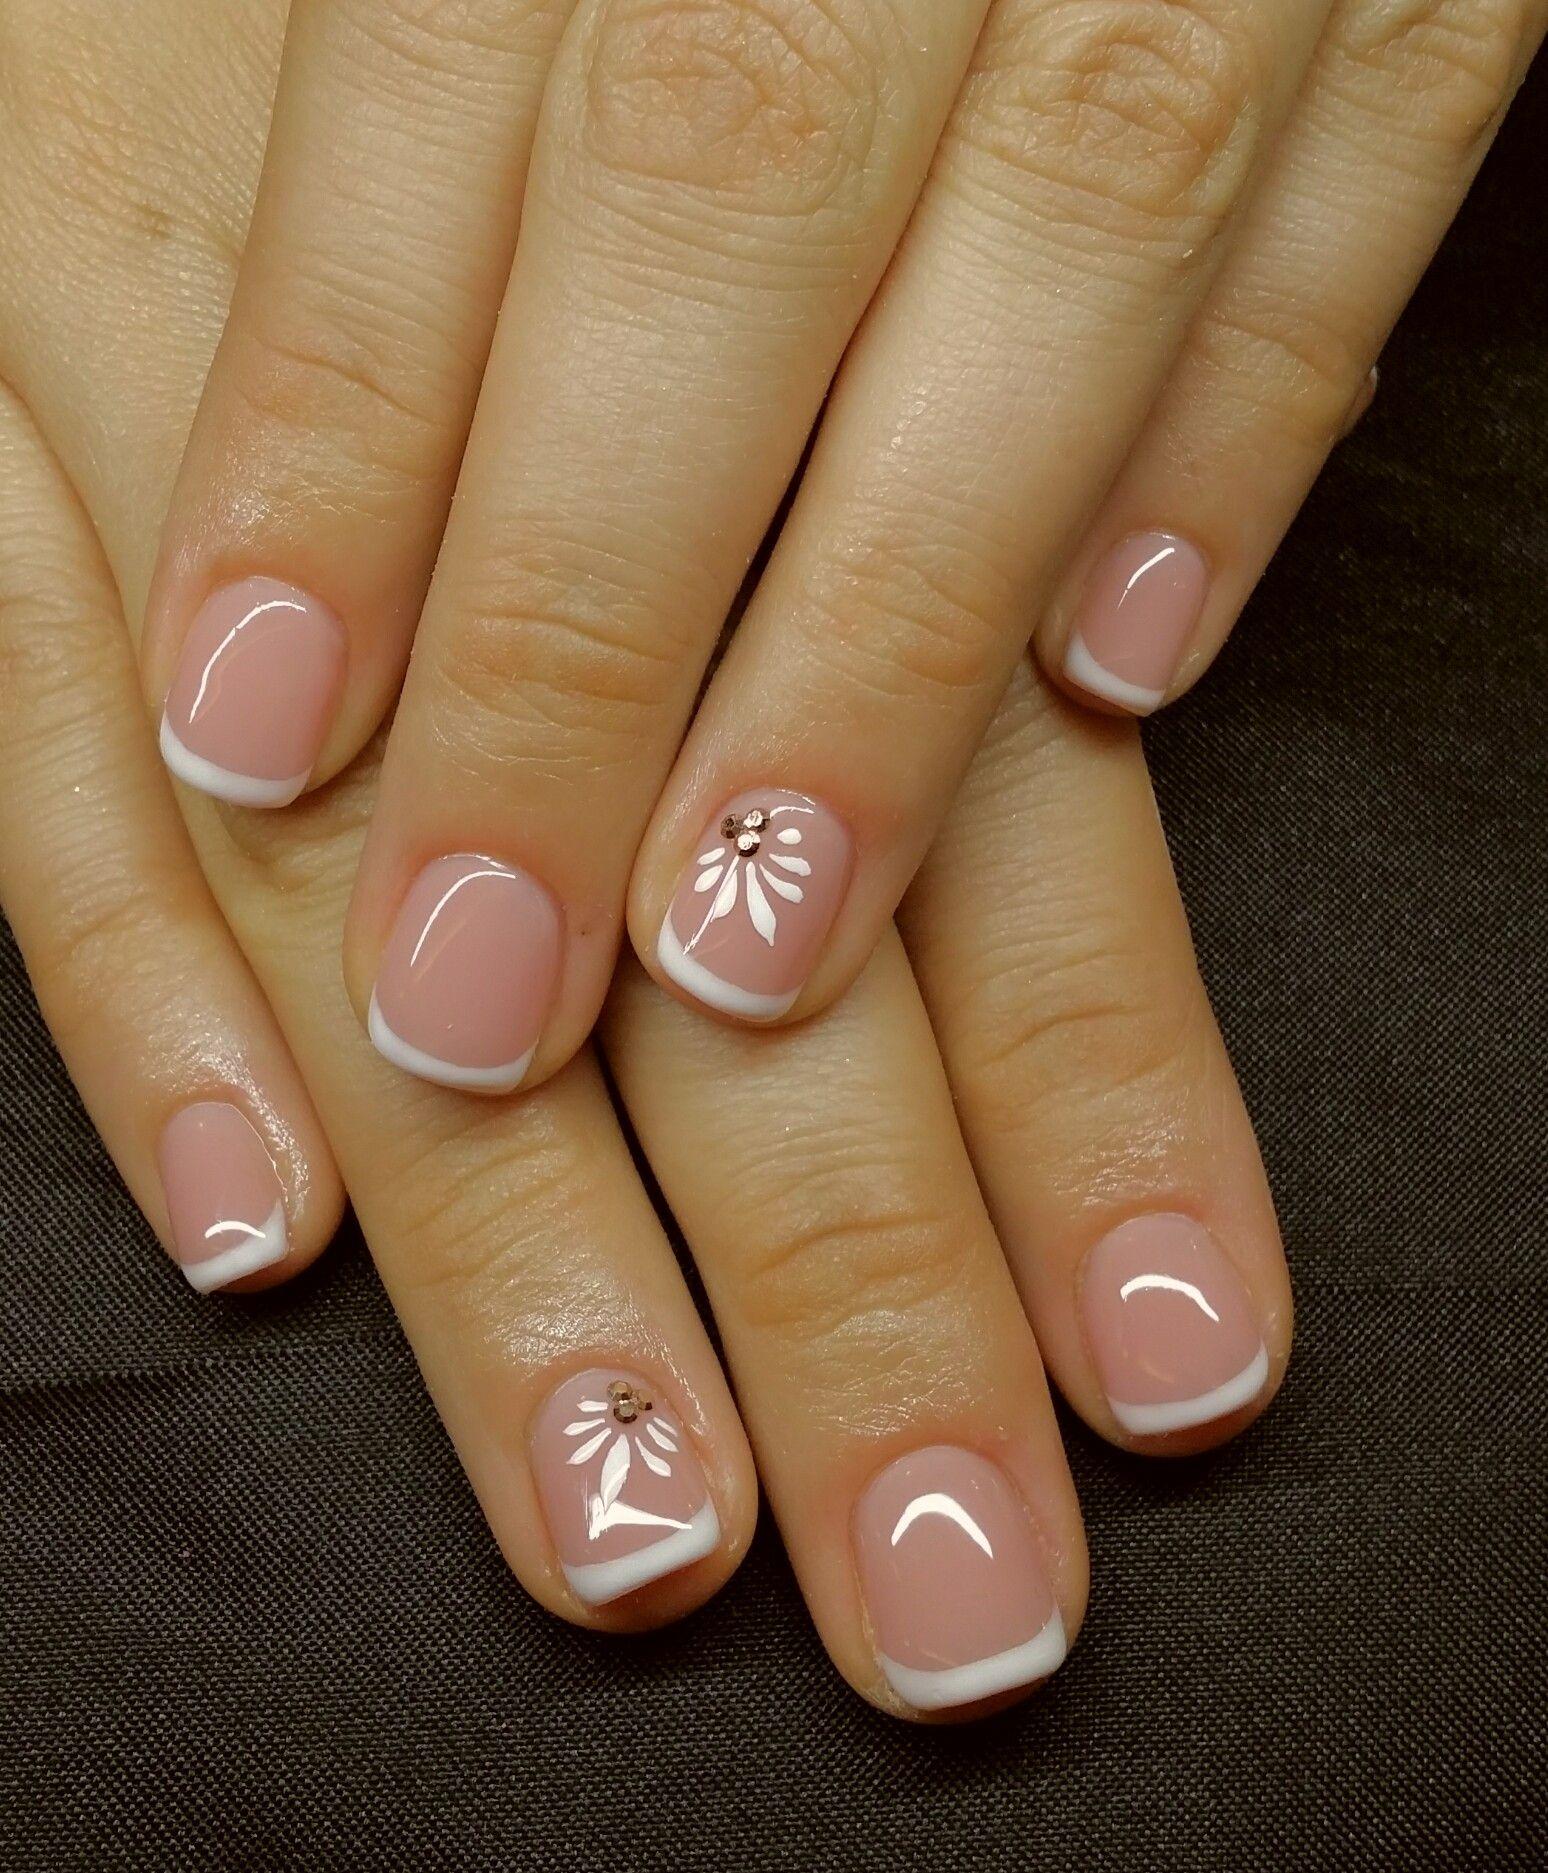 Keptalalat A Kovetkezore Francia Gellakk Sunflower Nails Sunflower Nail Art Spring Nails